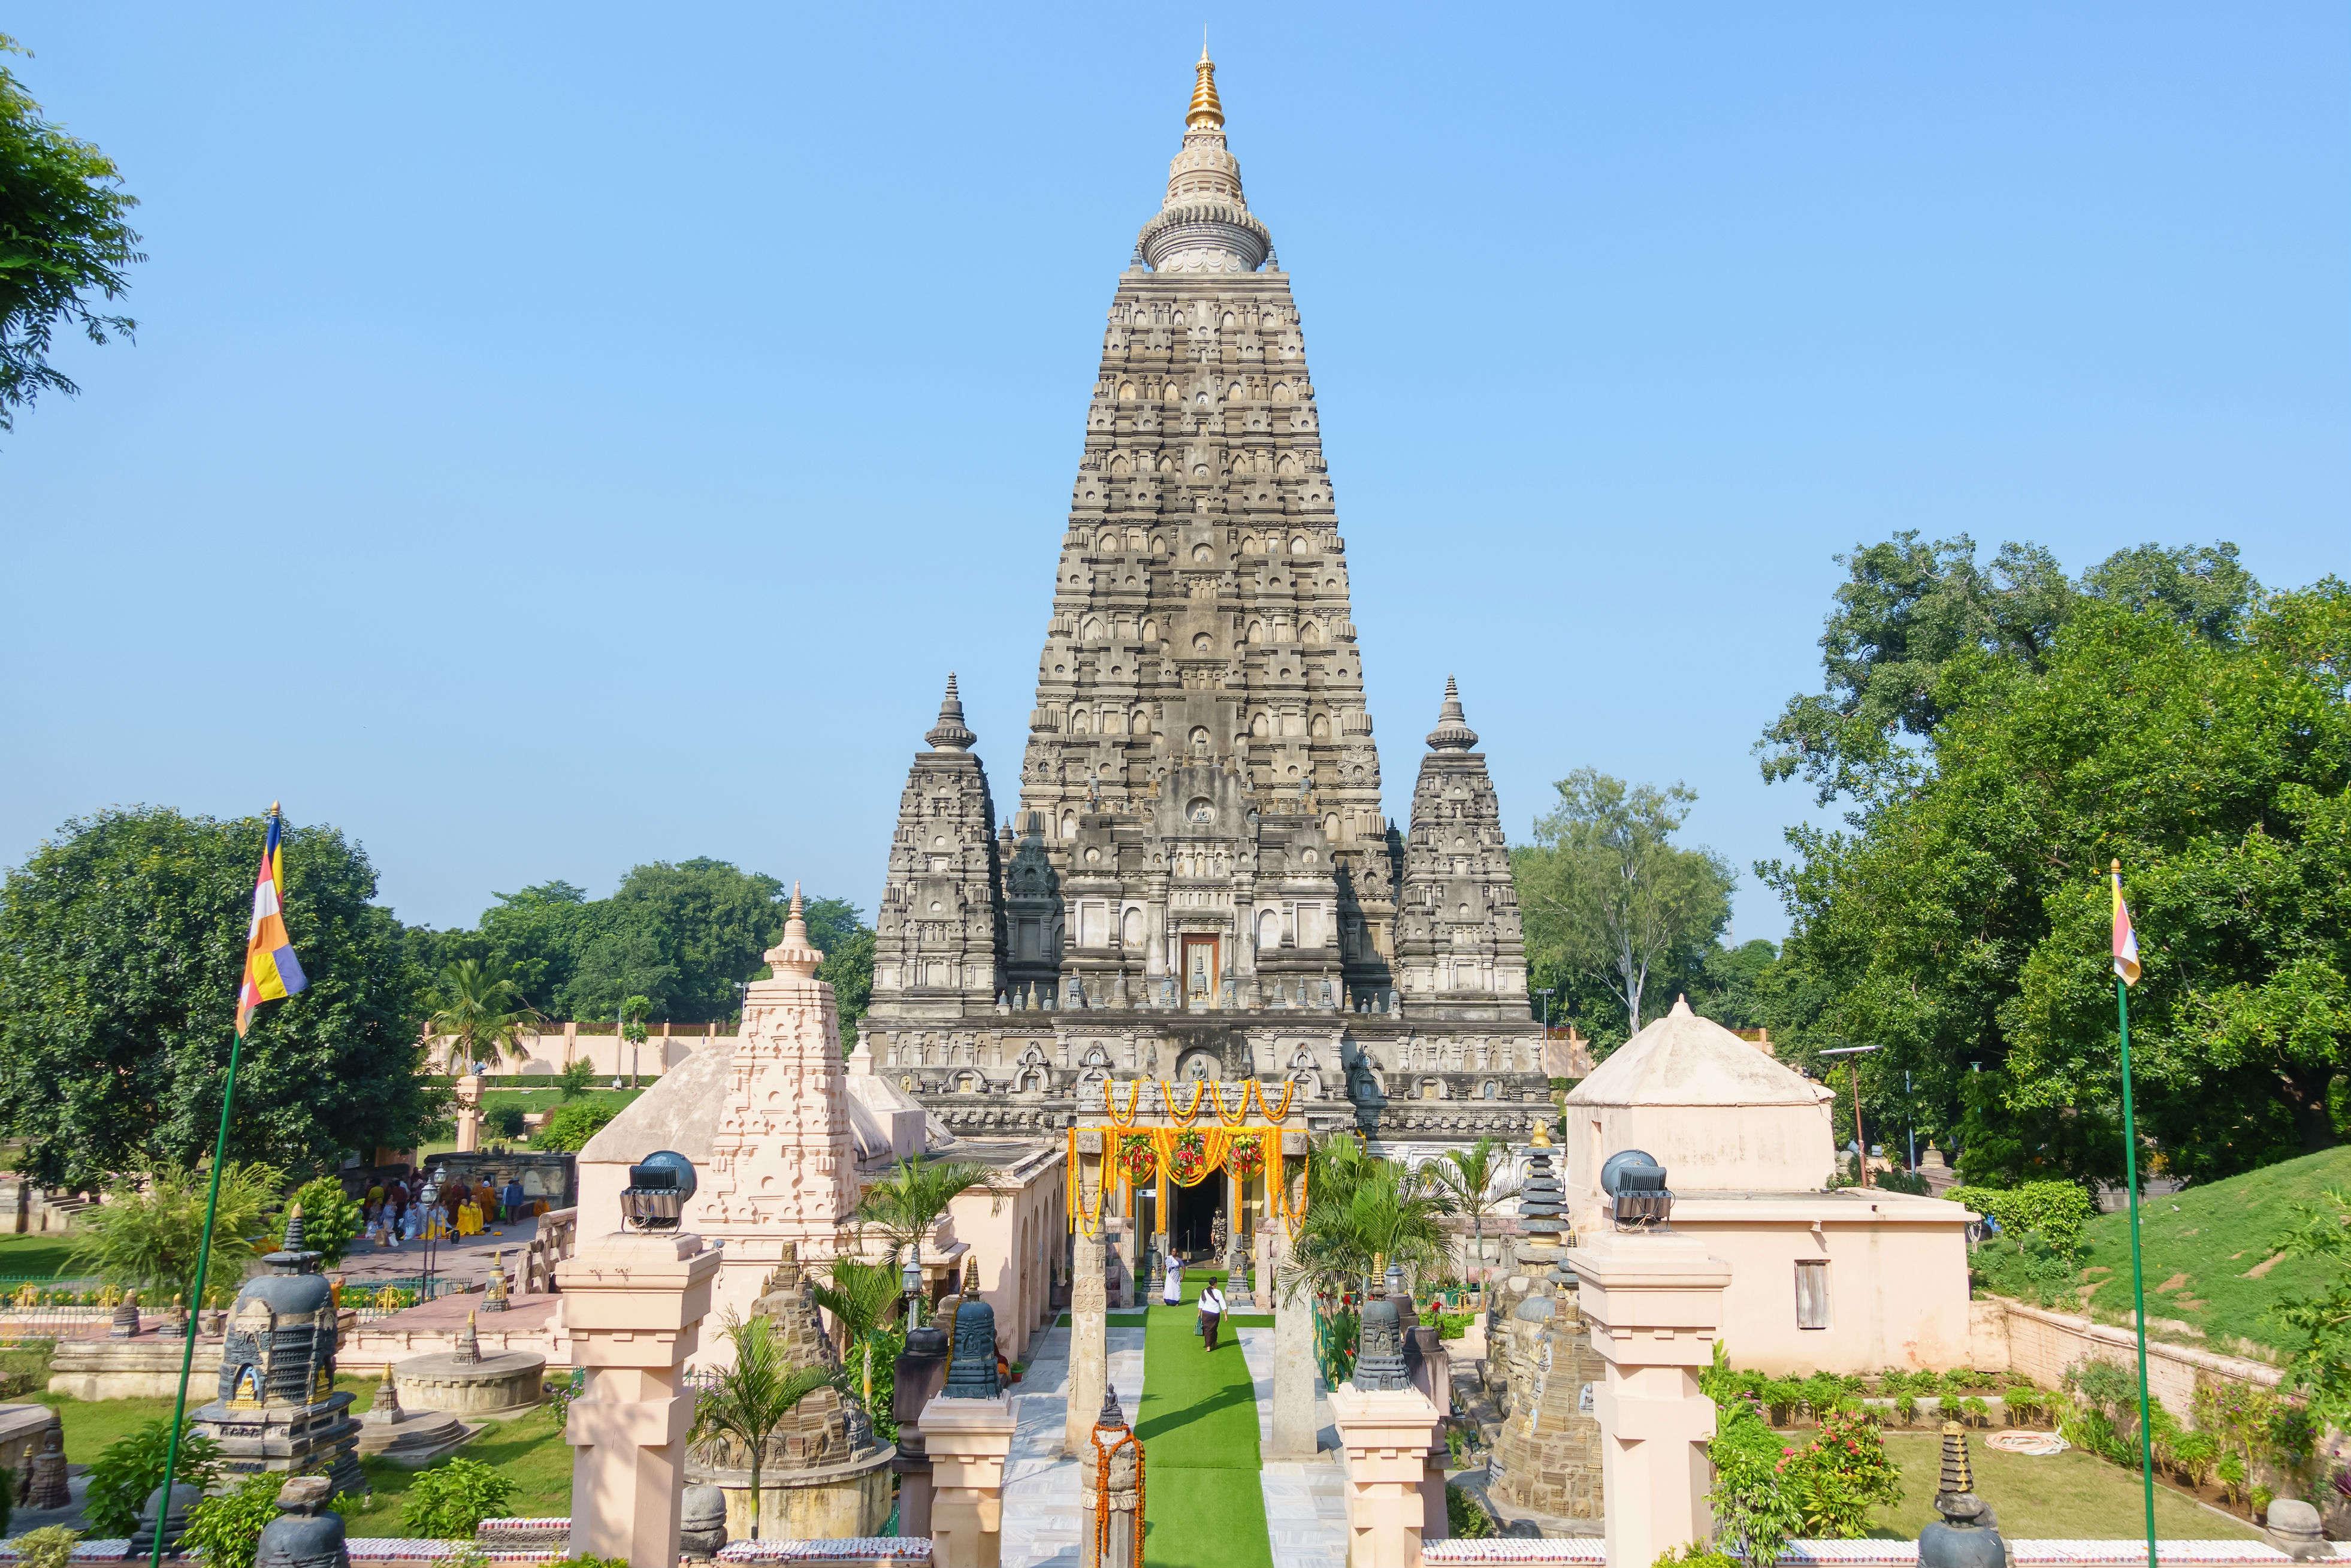 Bodh Gaya to be developed into a world-class tourist destination